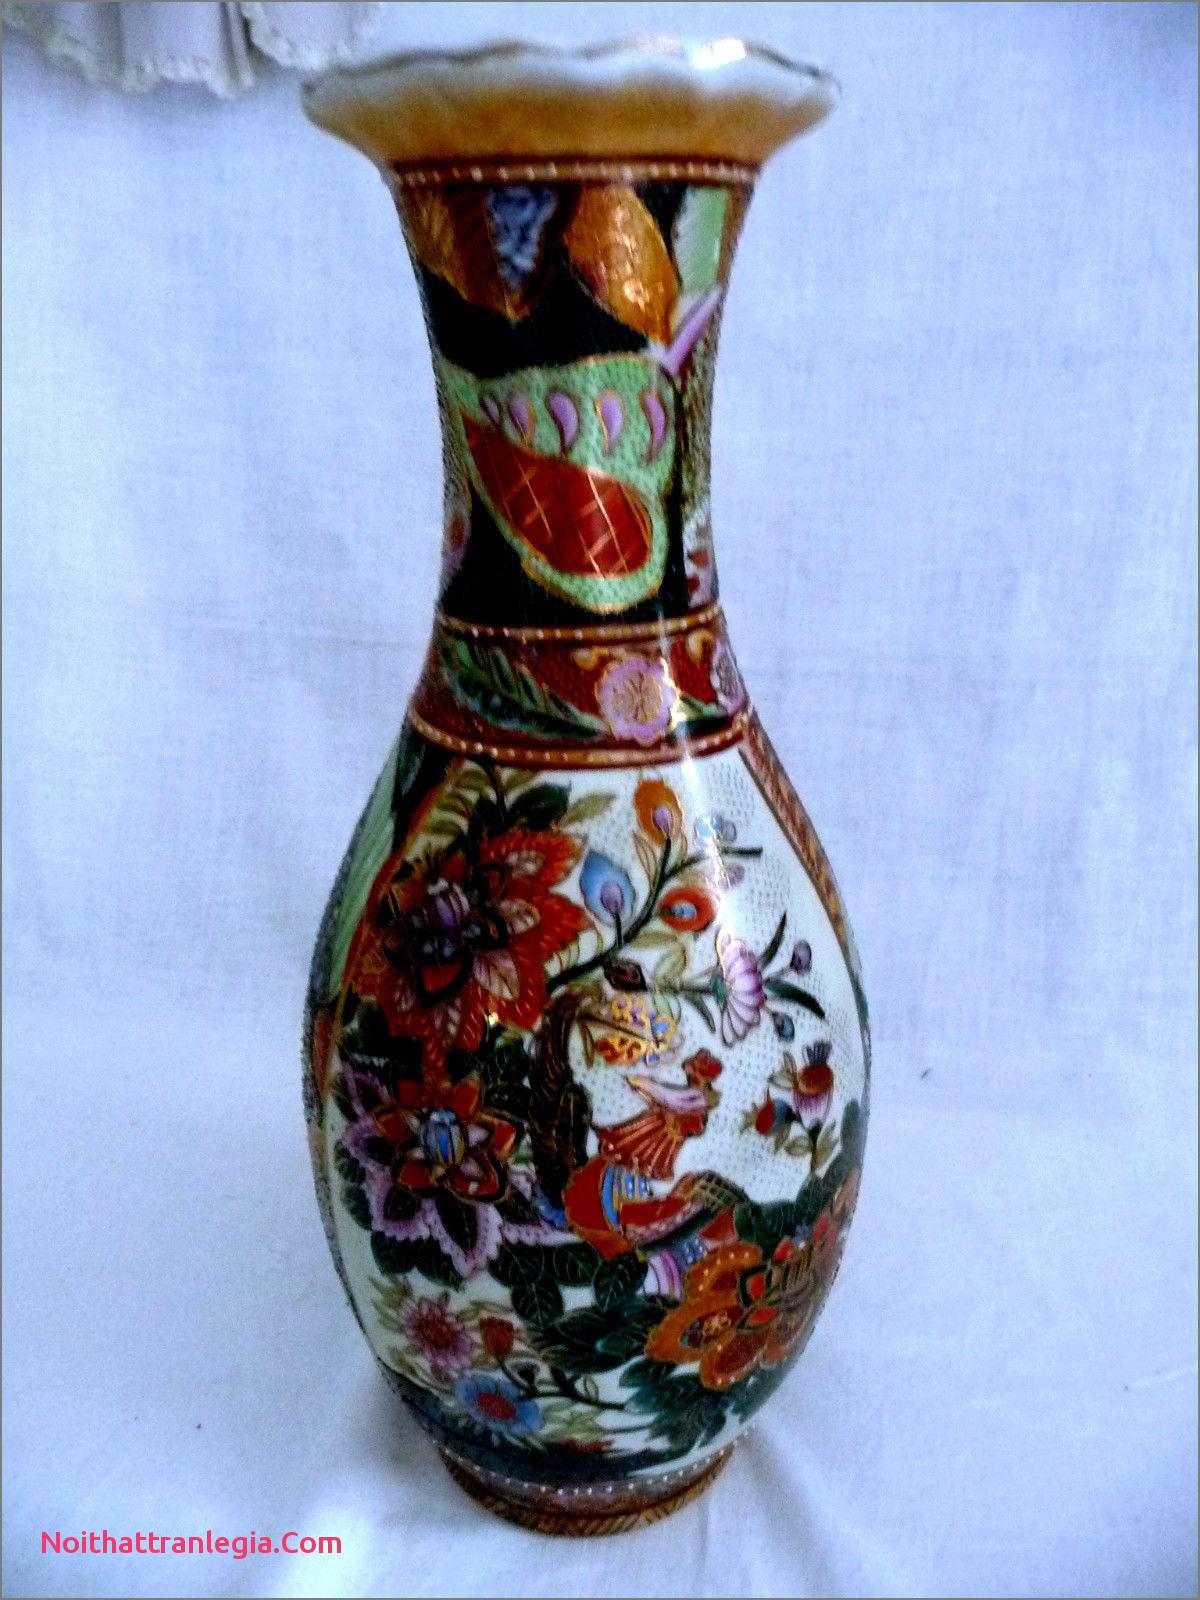 big chinese vases for sale of 20 chinese antique vase noithattranlegia vases design with regard to 1 von 11 siehe mehr aus nachlass prachtvolle antike 38cm grosse vase aus japan od from chinese